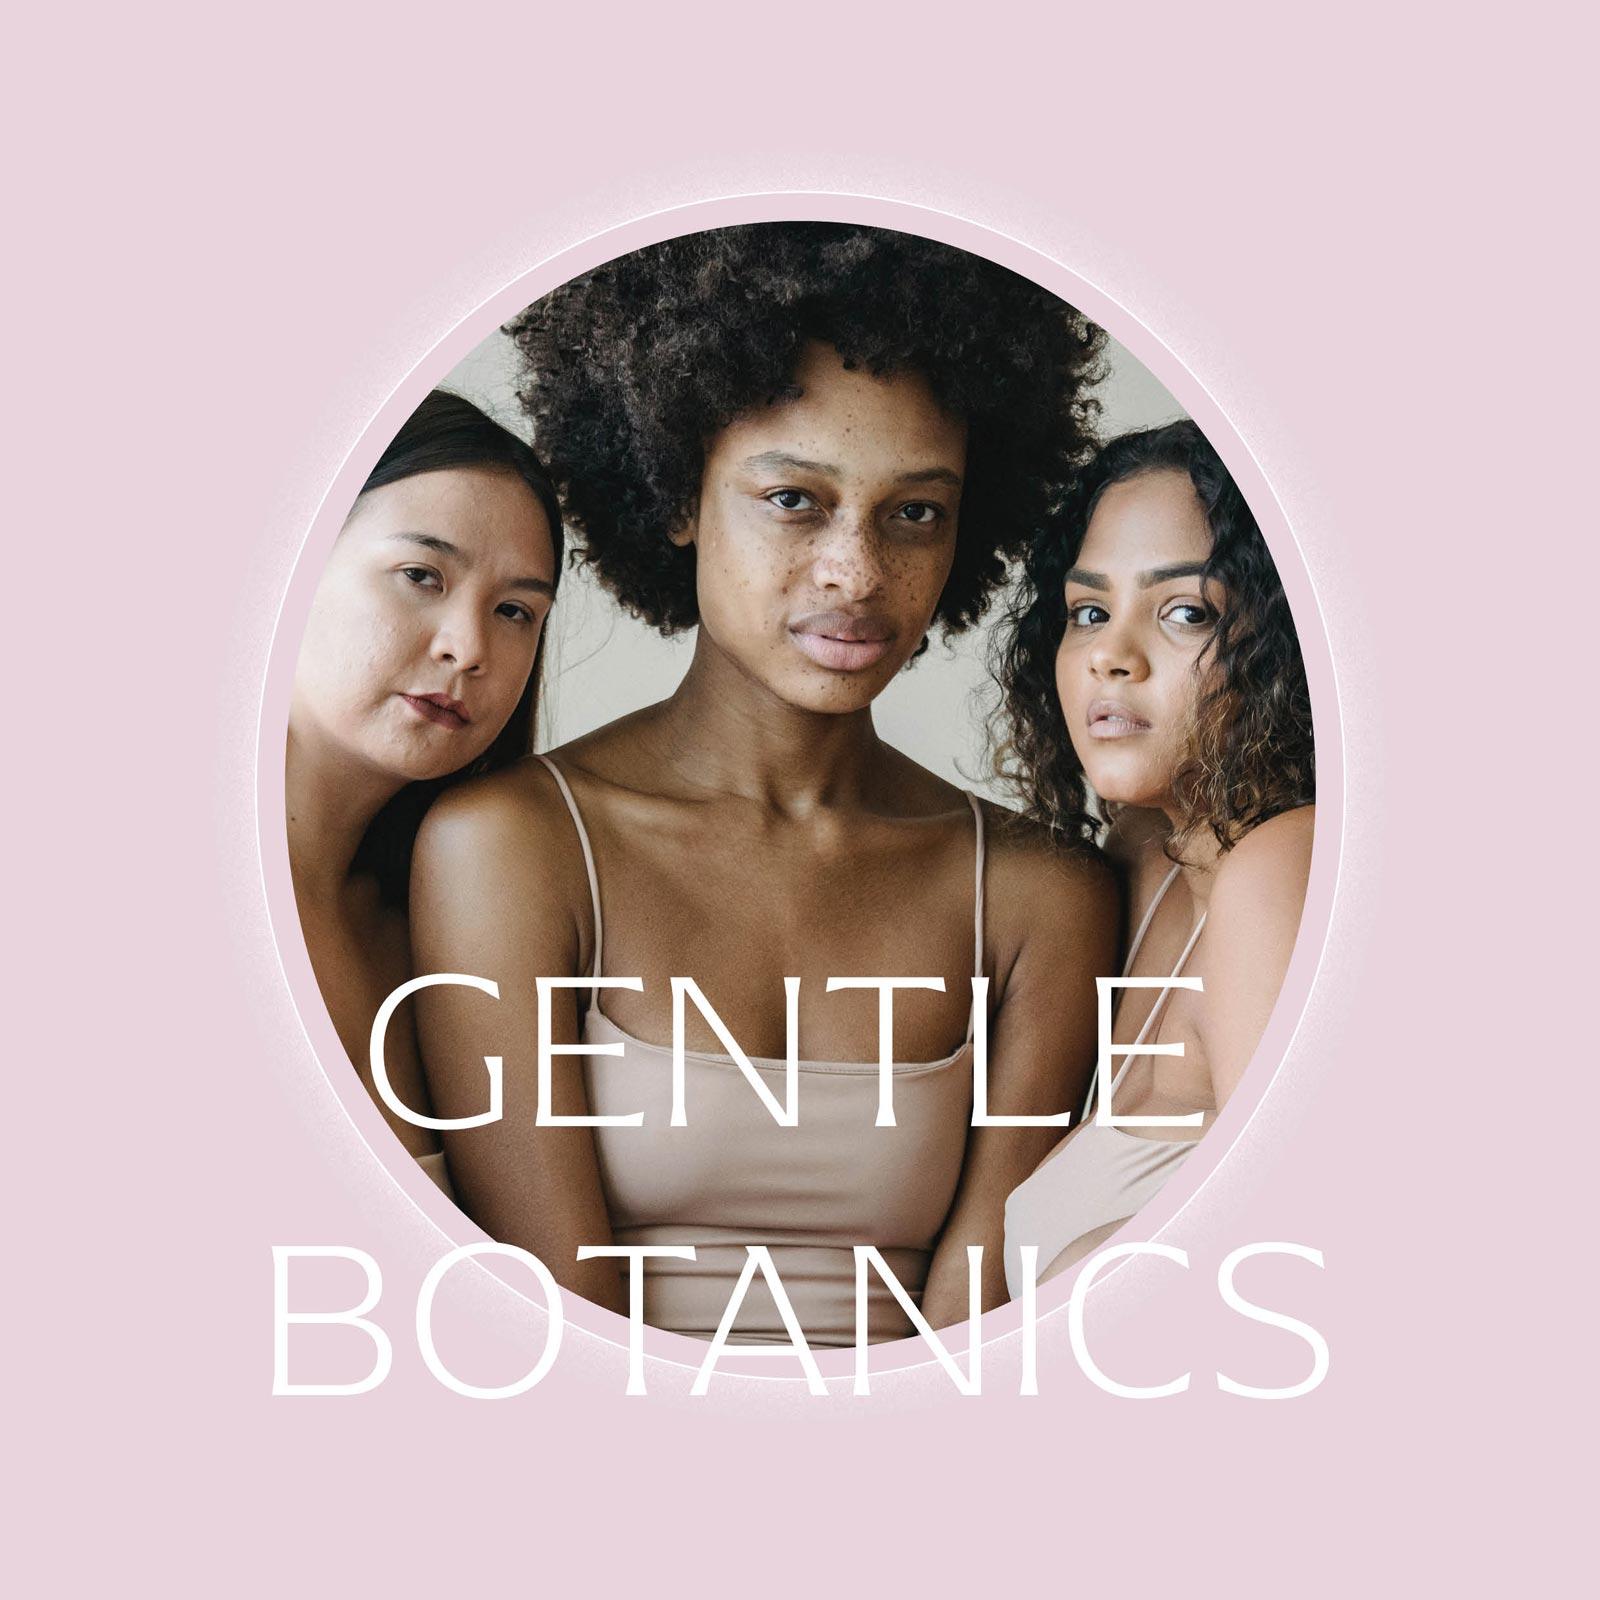 Gentle Botanics Brand Kit